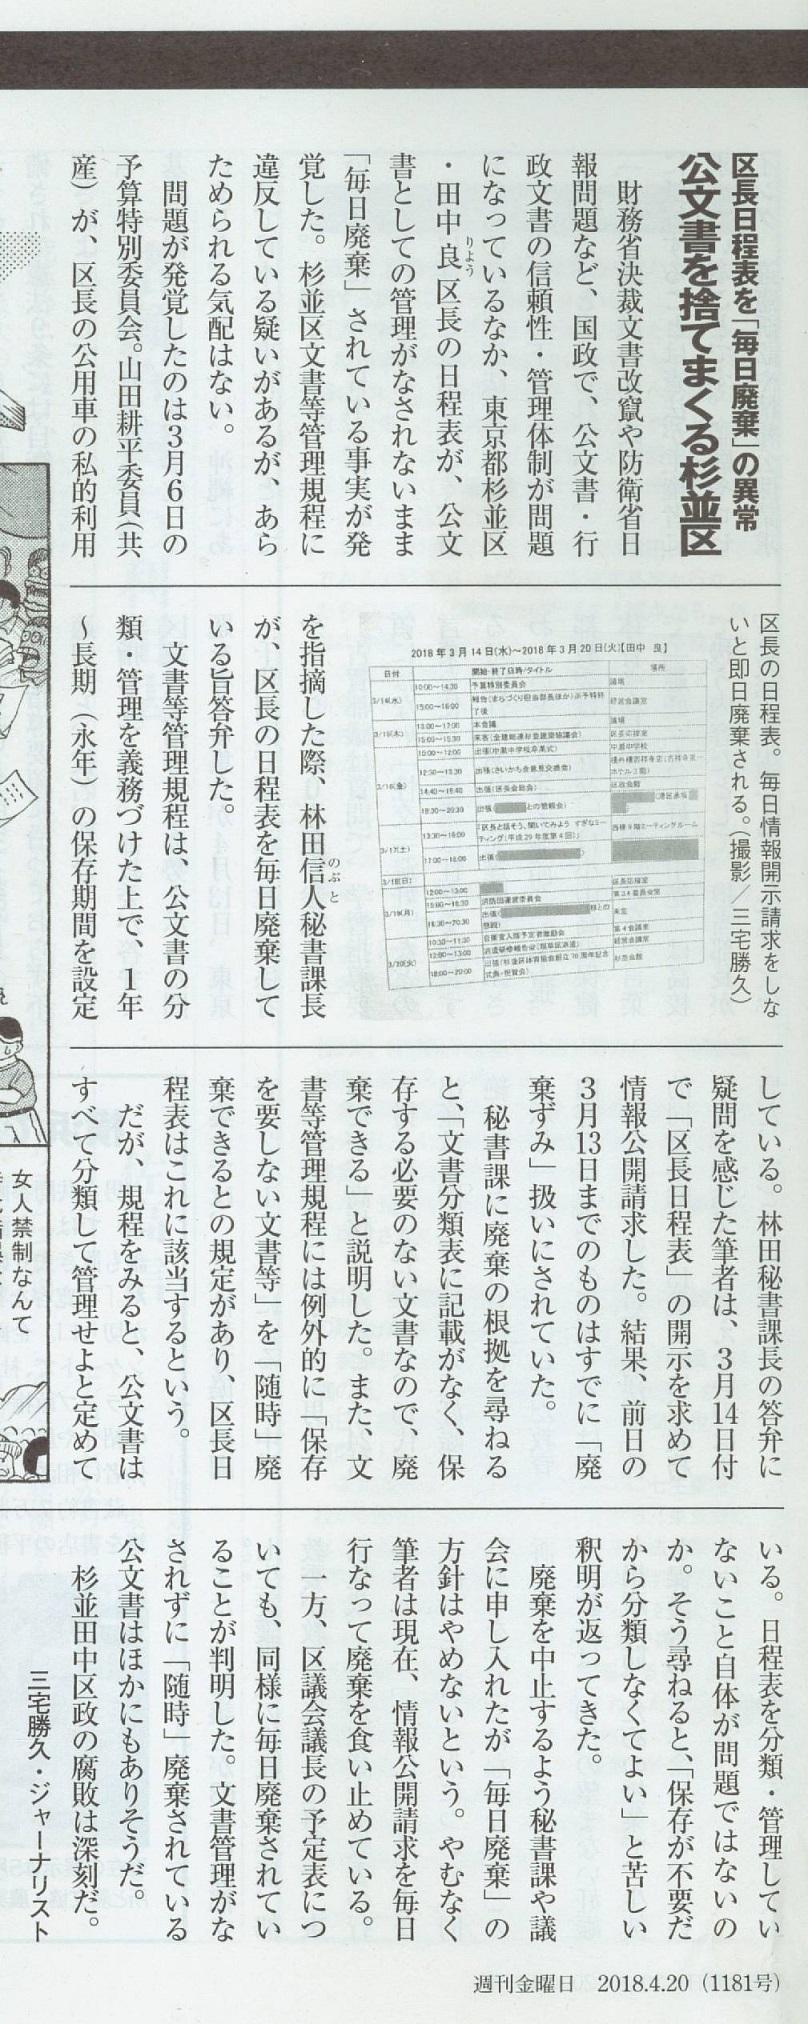 http://yamadakohei.jp/blog_upfile/%E9%80%B1%E5%88%8A%E9%87%91%E6%9B%9C%E3%81%AB4%E6%9C%8820%E6%97%A5%E5%8F%B7%E8%A8%98%E4%BA%8B.jpg